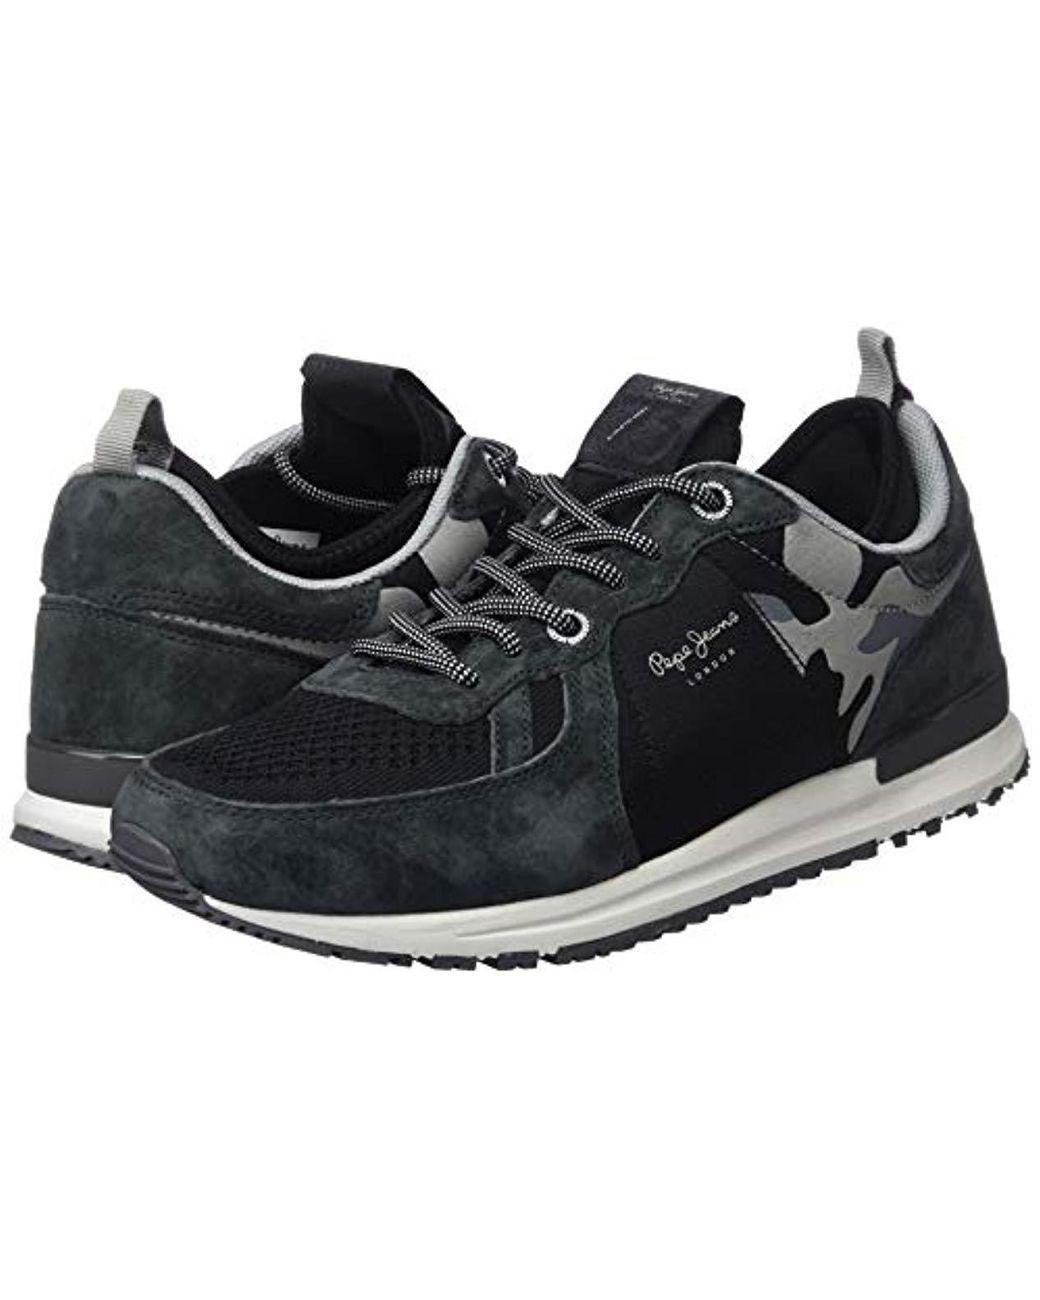 Pepe Jeans London Tinker Pro 73, Low top Sneakers in Black